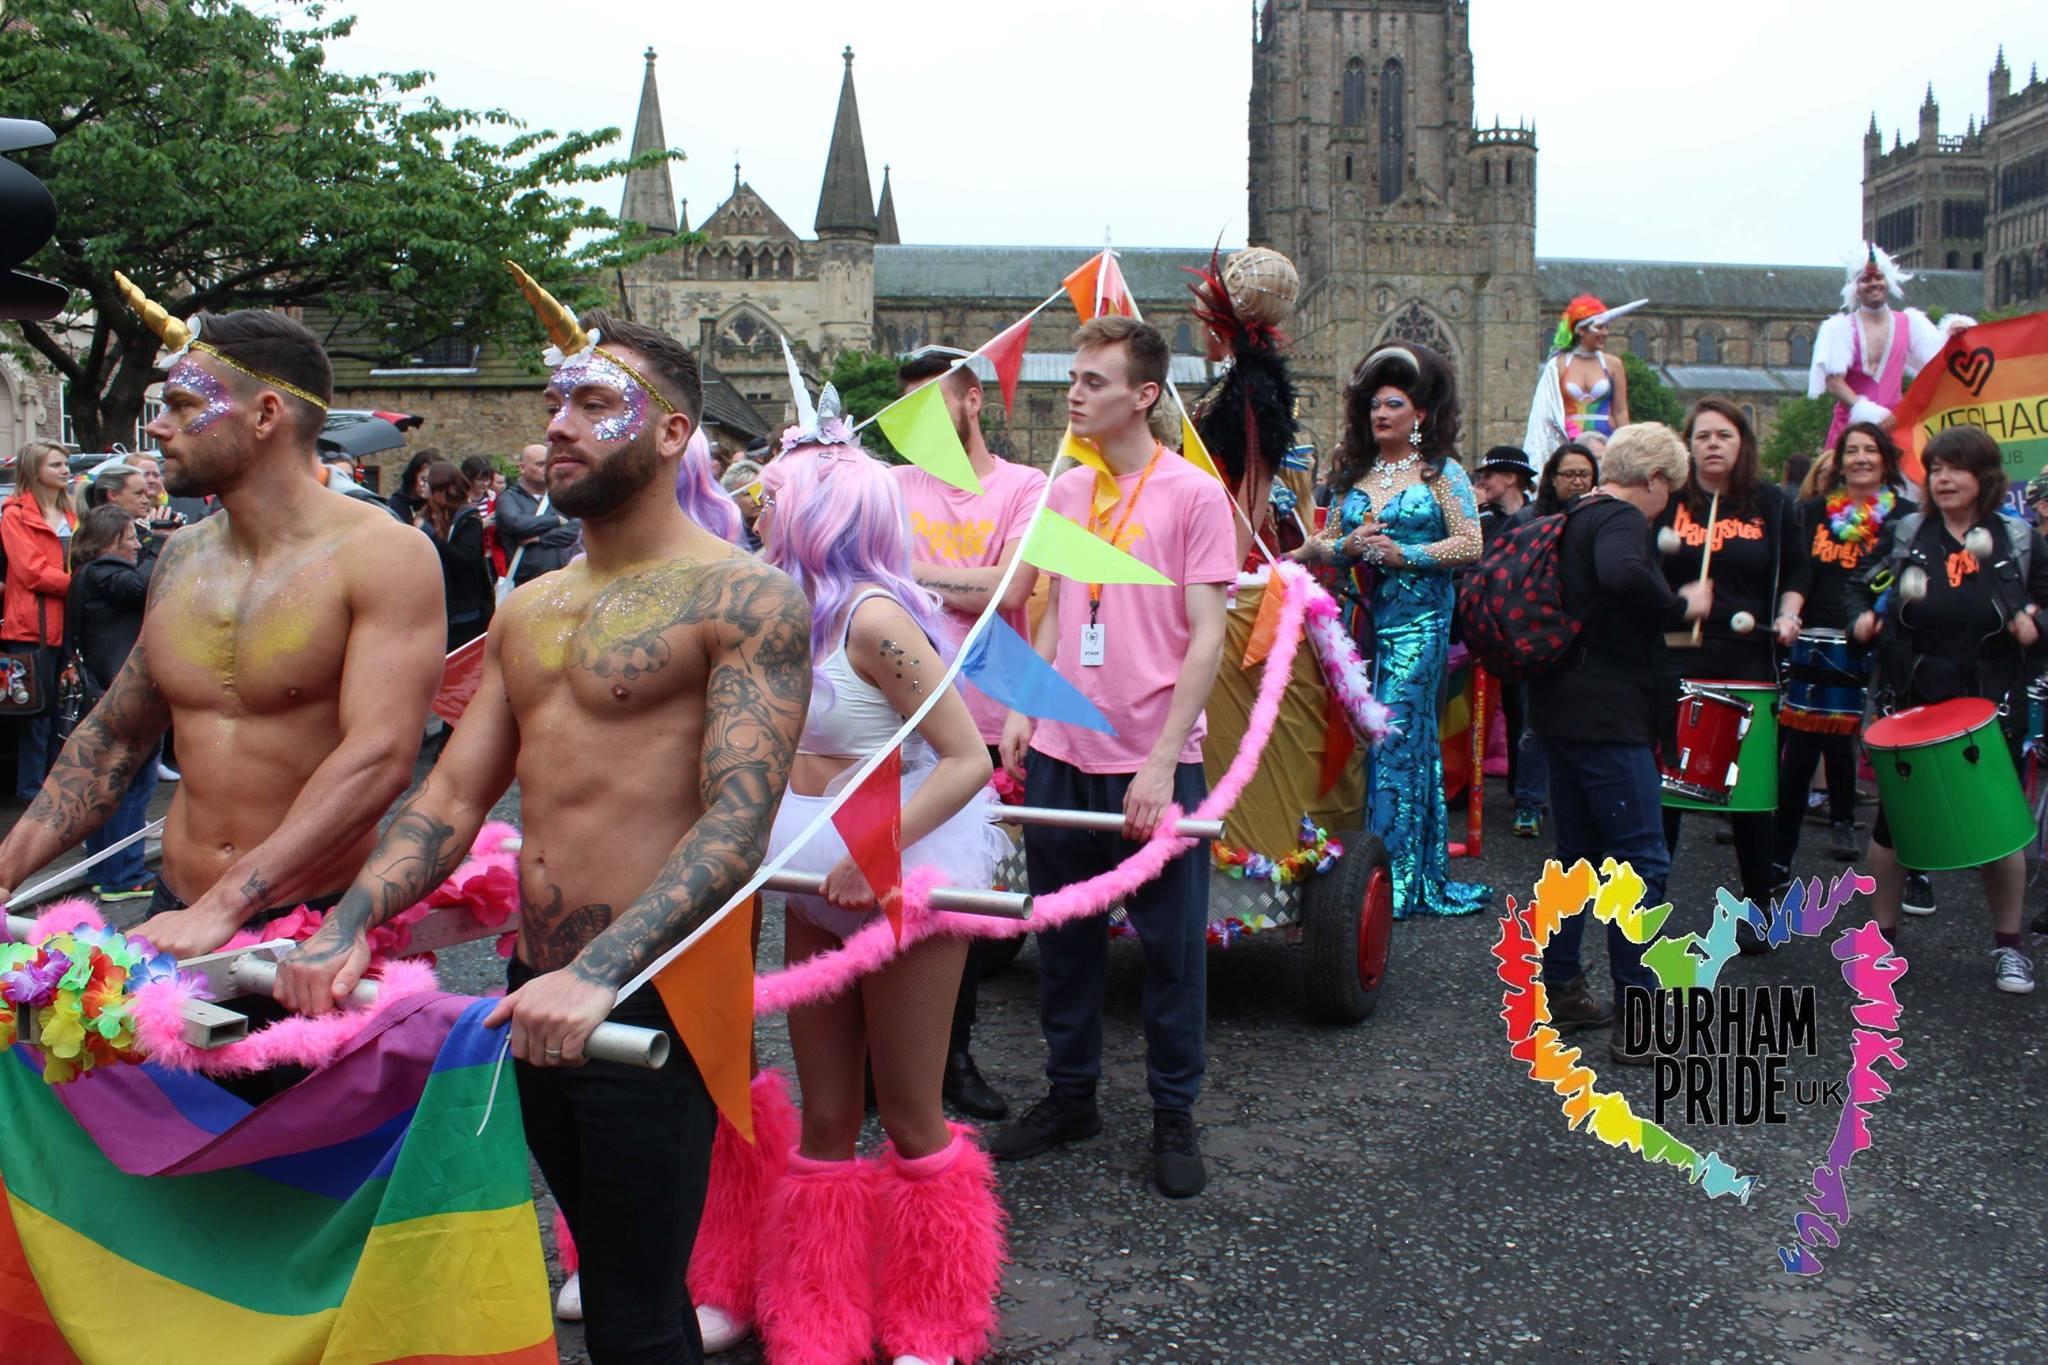 Photo credit: Durham Pride UK